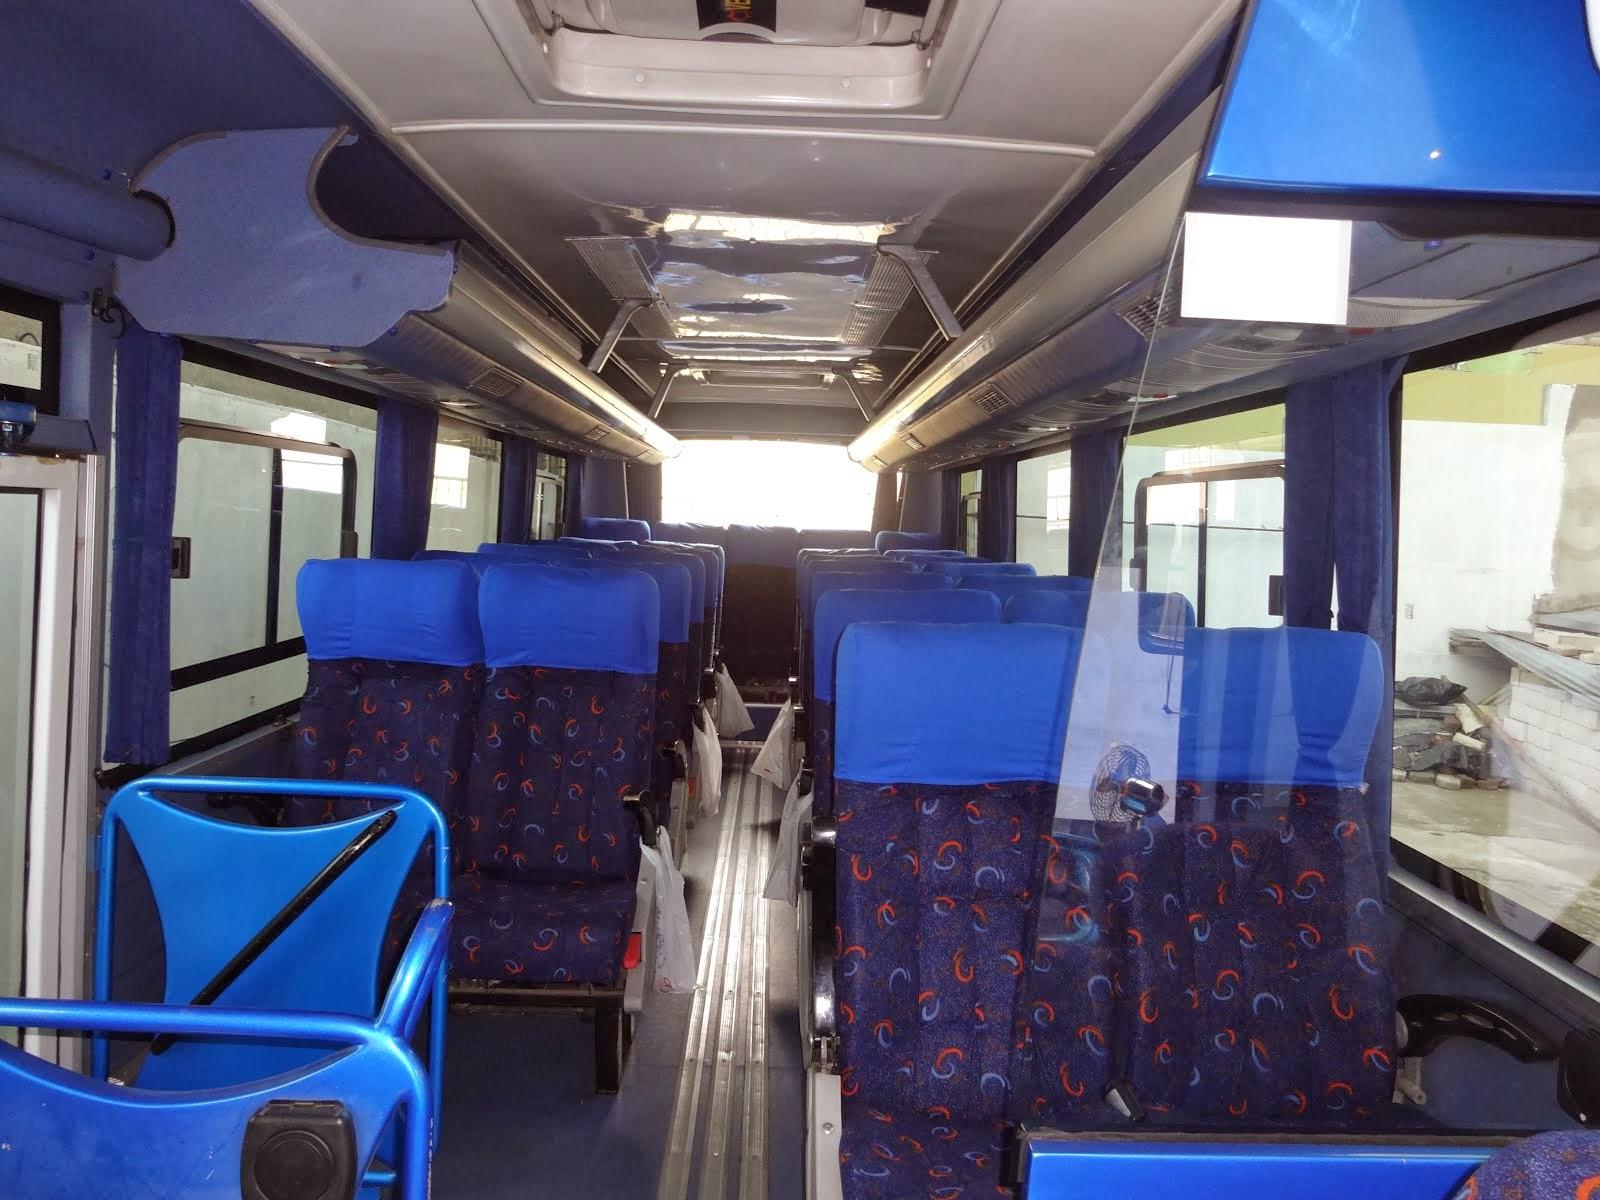 Capacidad 28 pasajeros